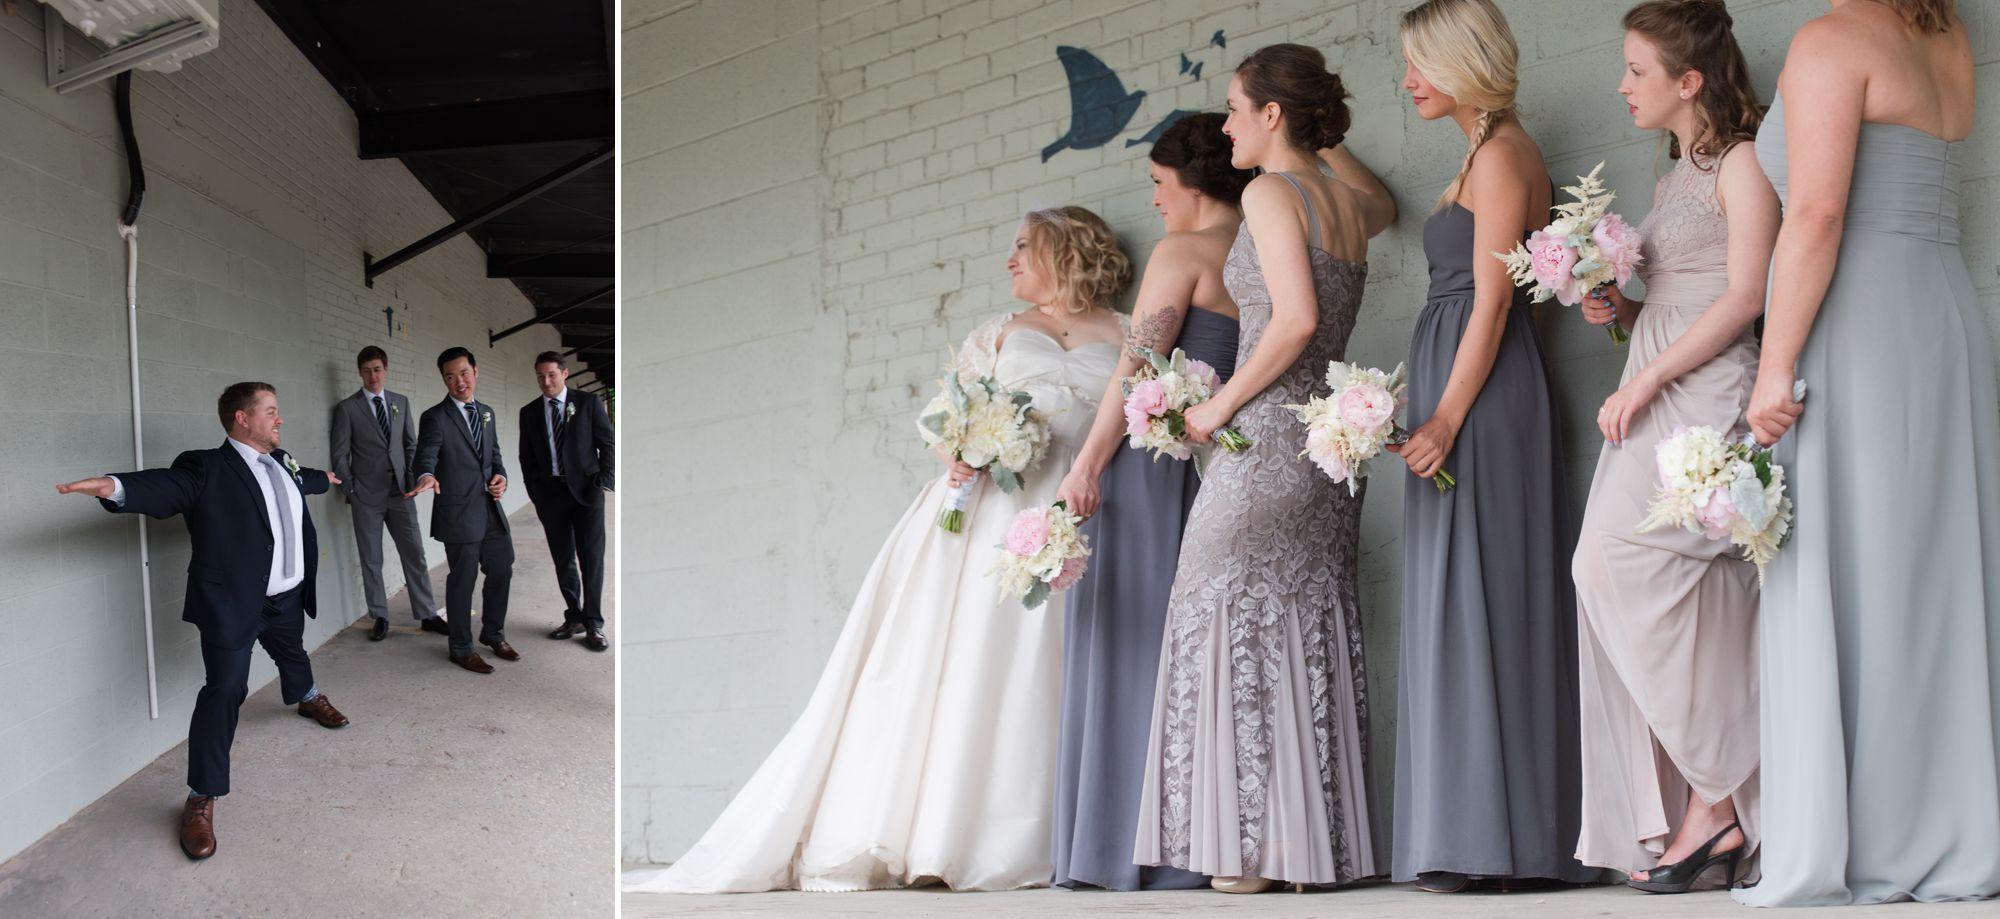 uptown-charlotte-warhouse-wedding 54